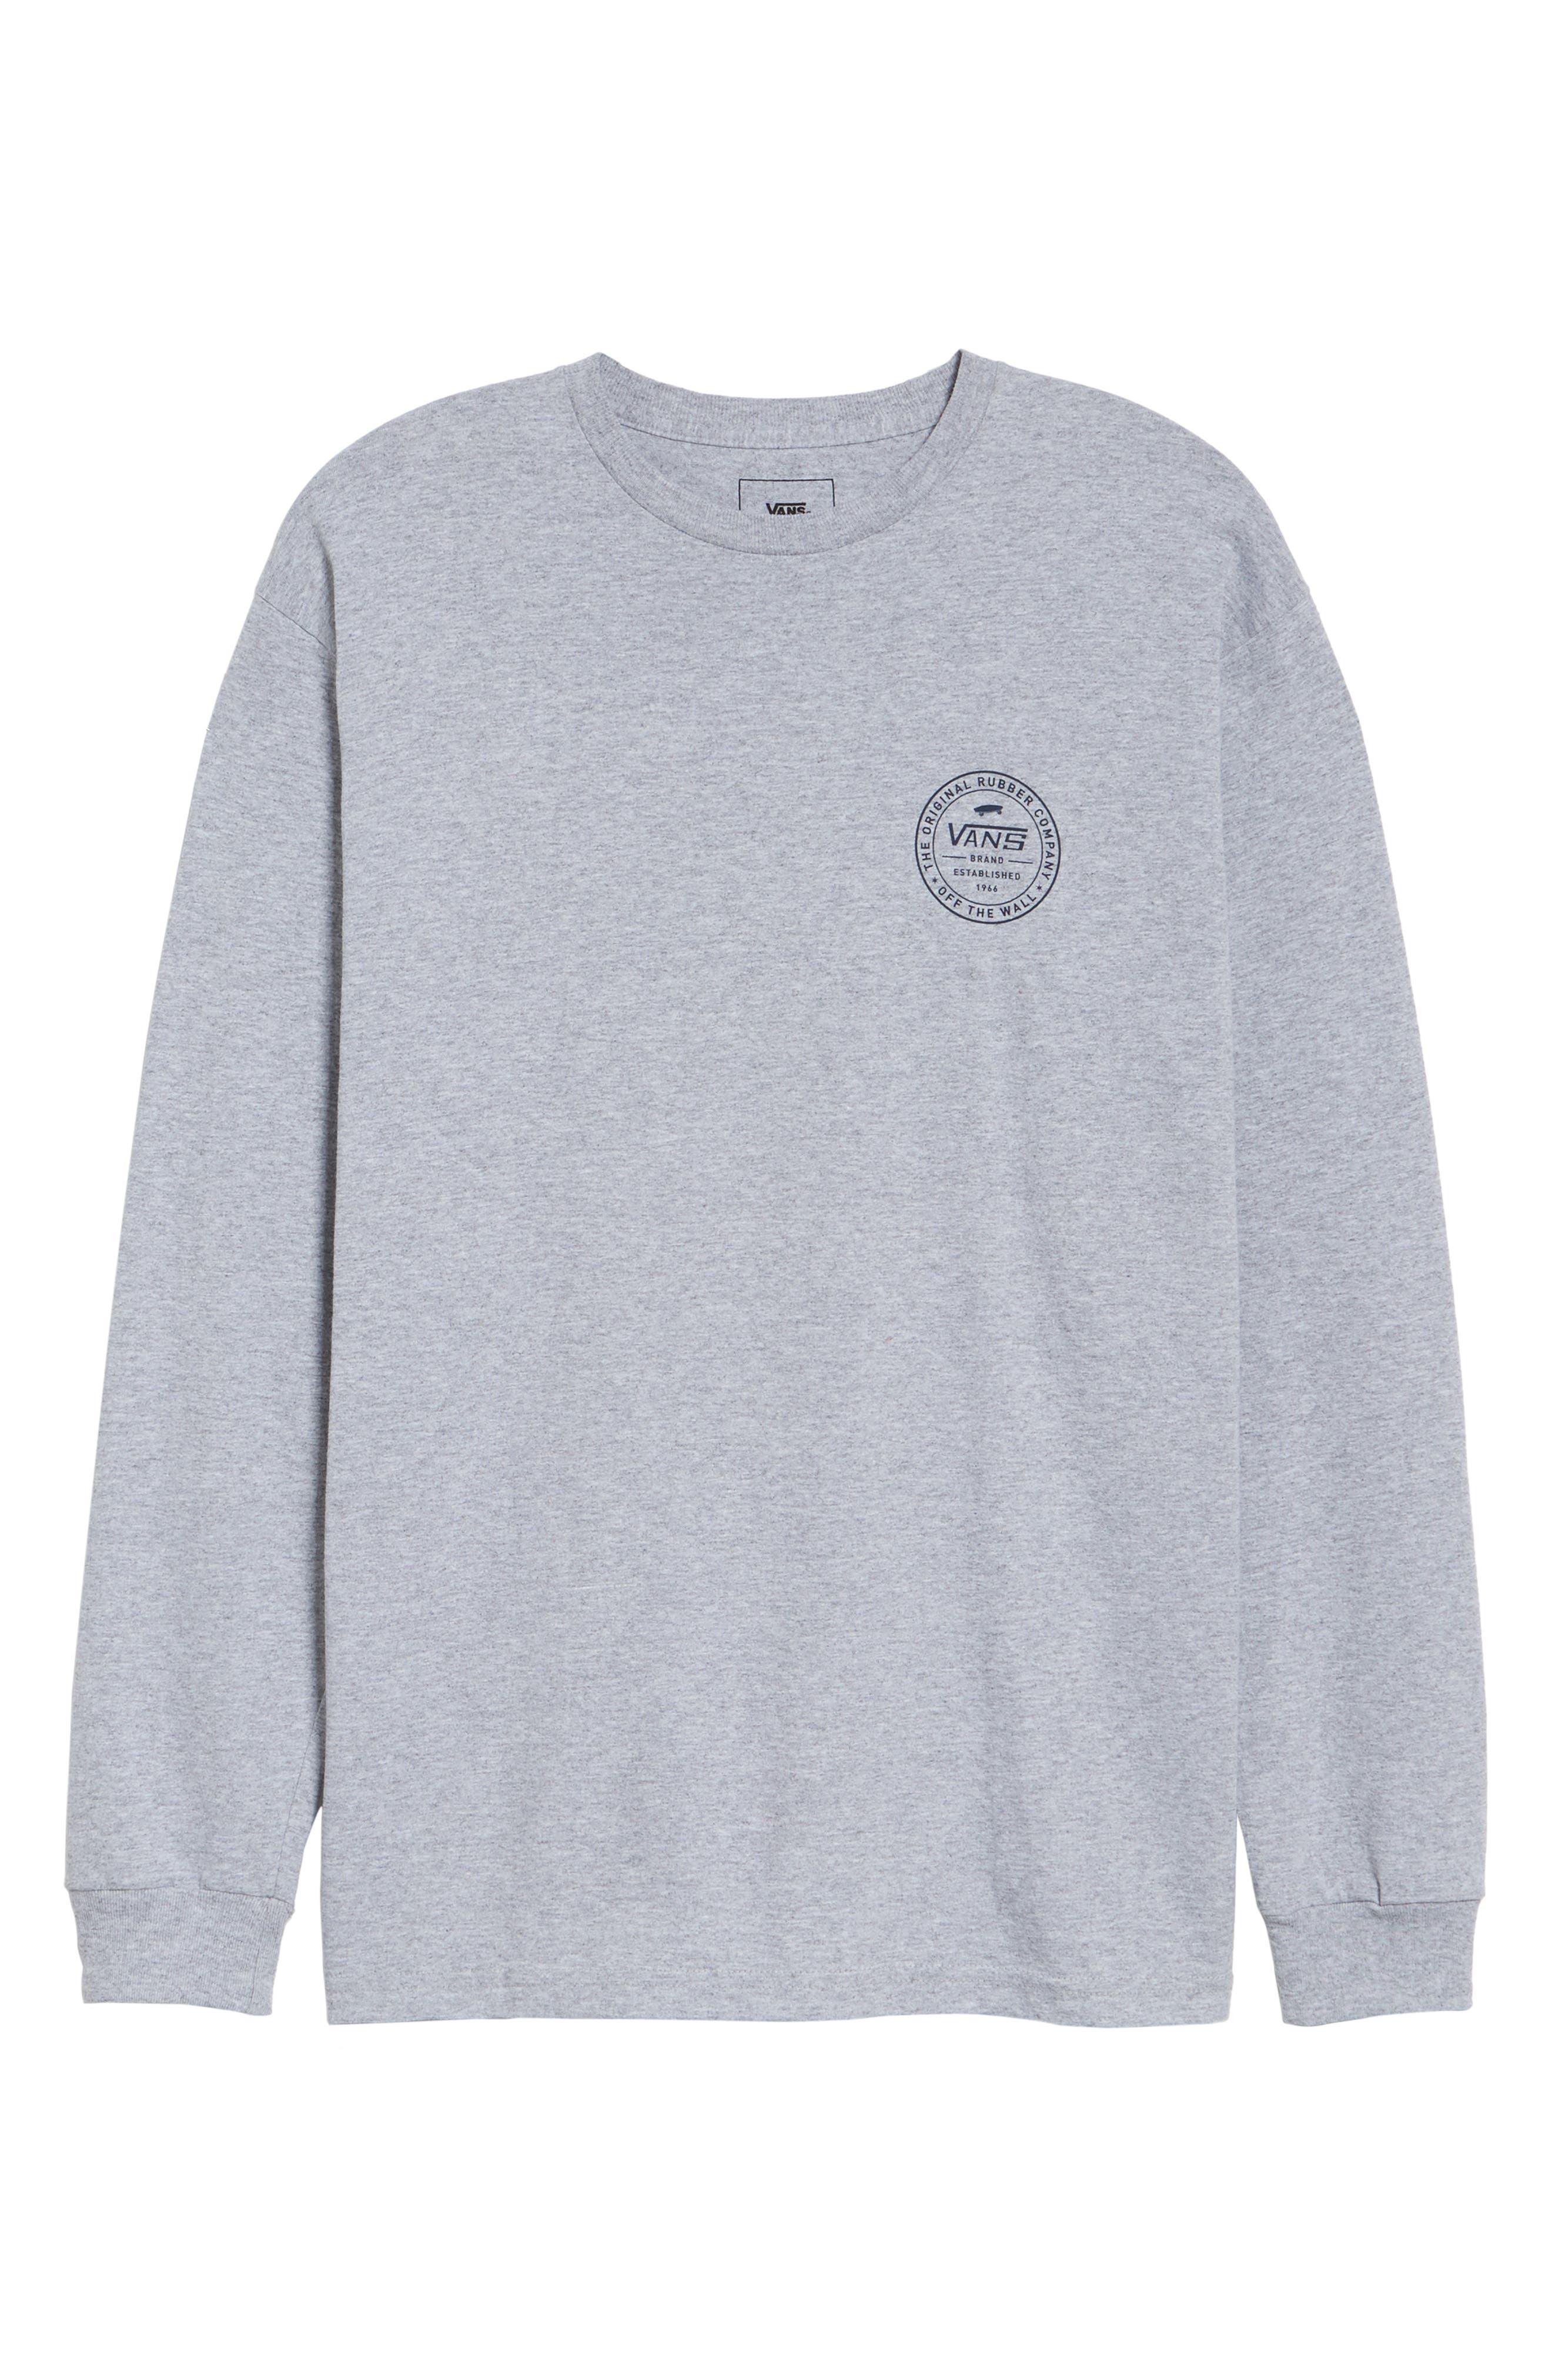 Established '66 Graphic T-Shirt,                             Alternate thumbnail 6, color,                             Grey